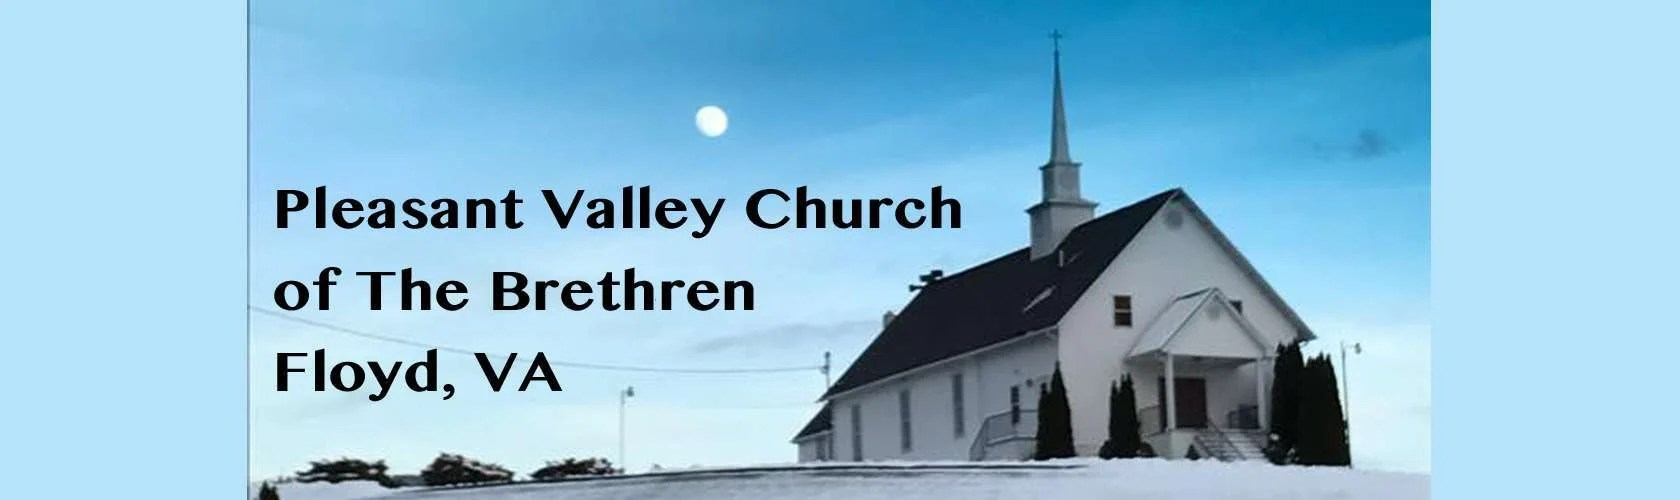 Pleasant Valley Church of the Brethren